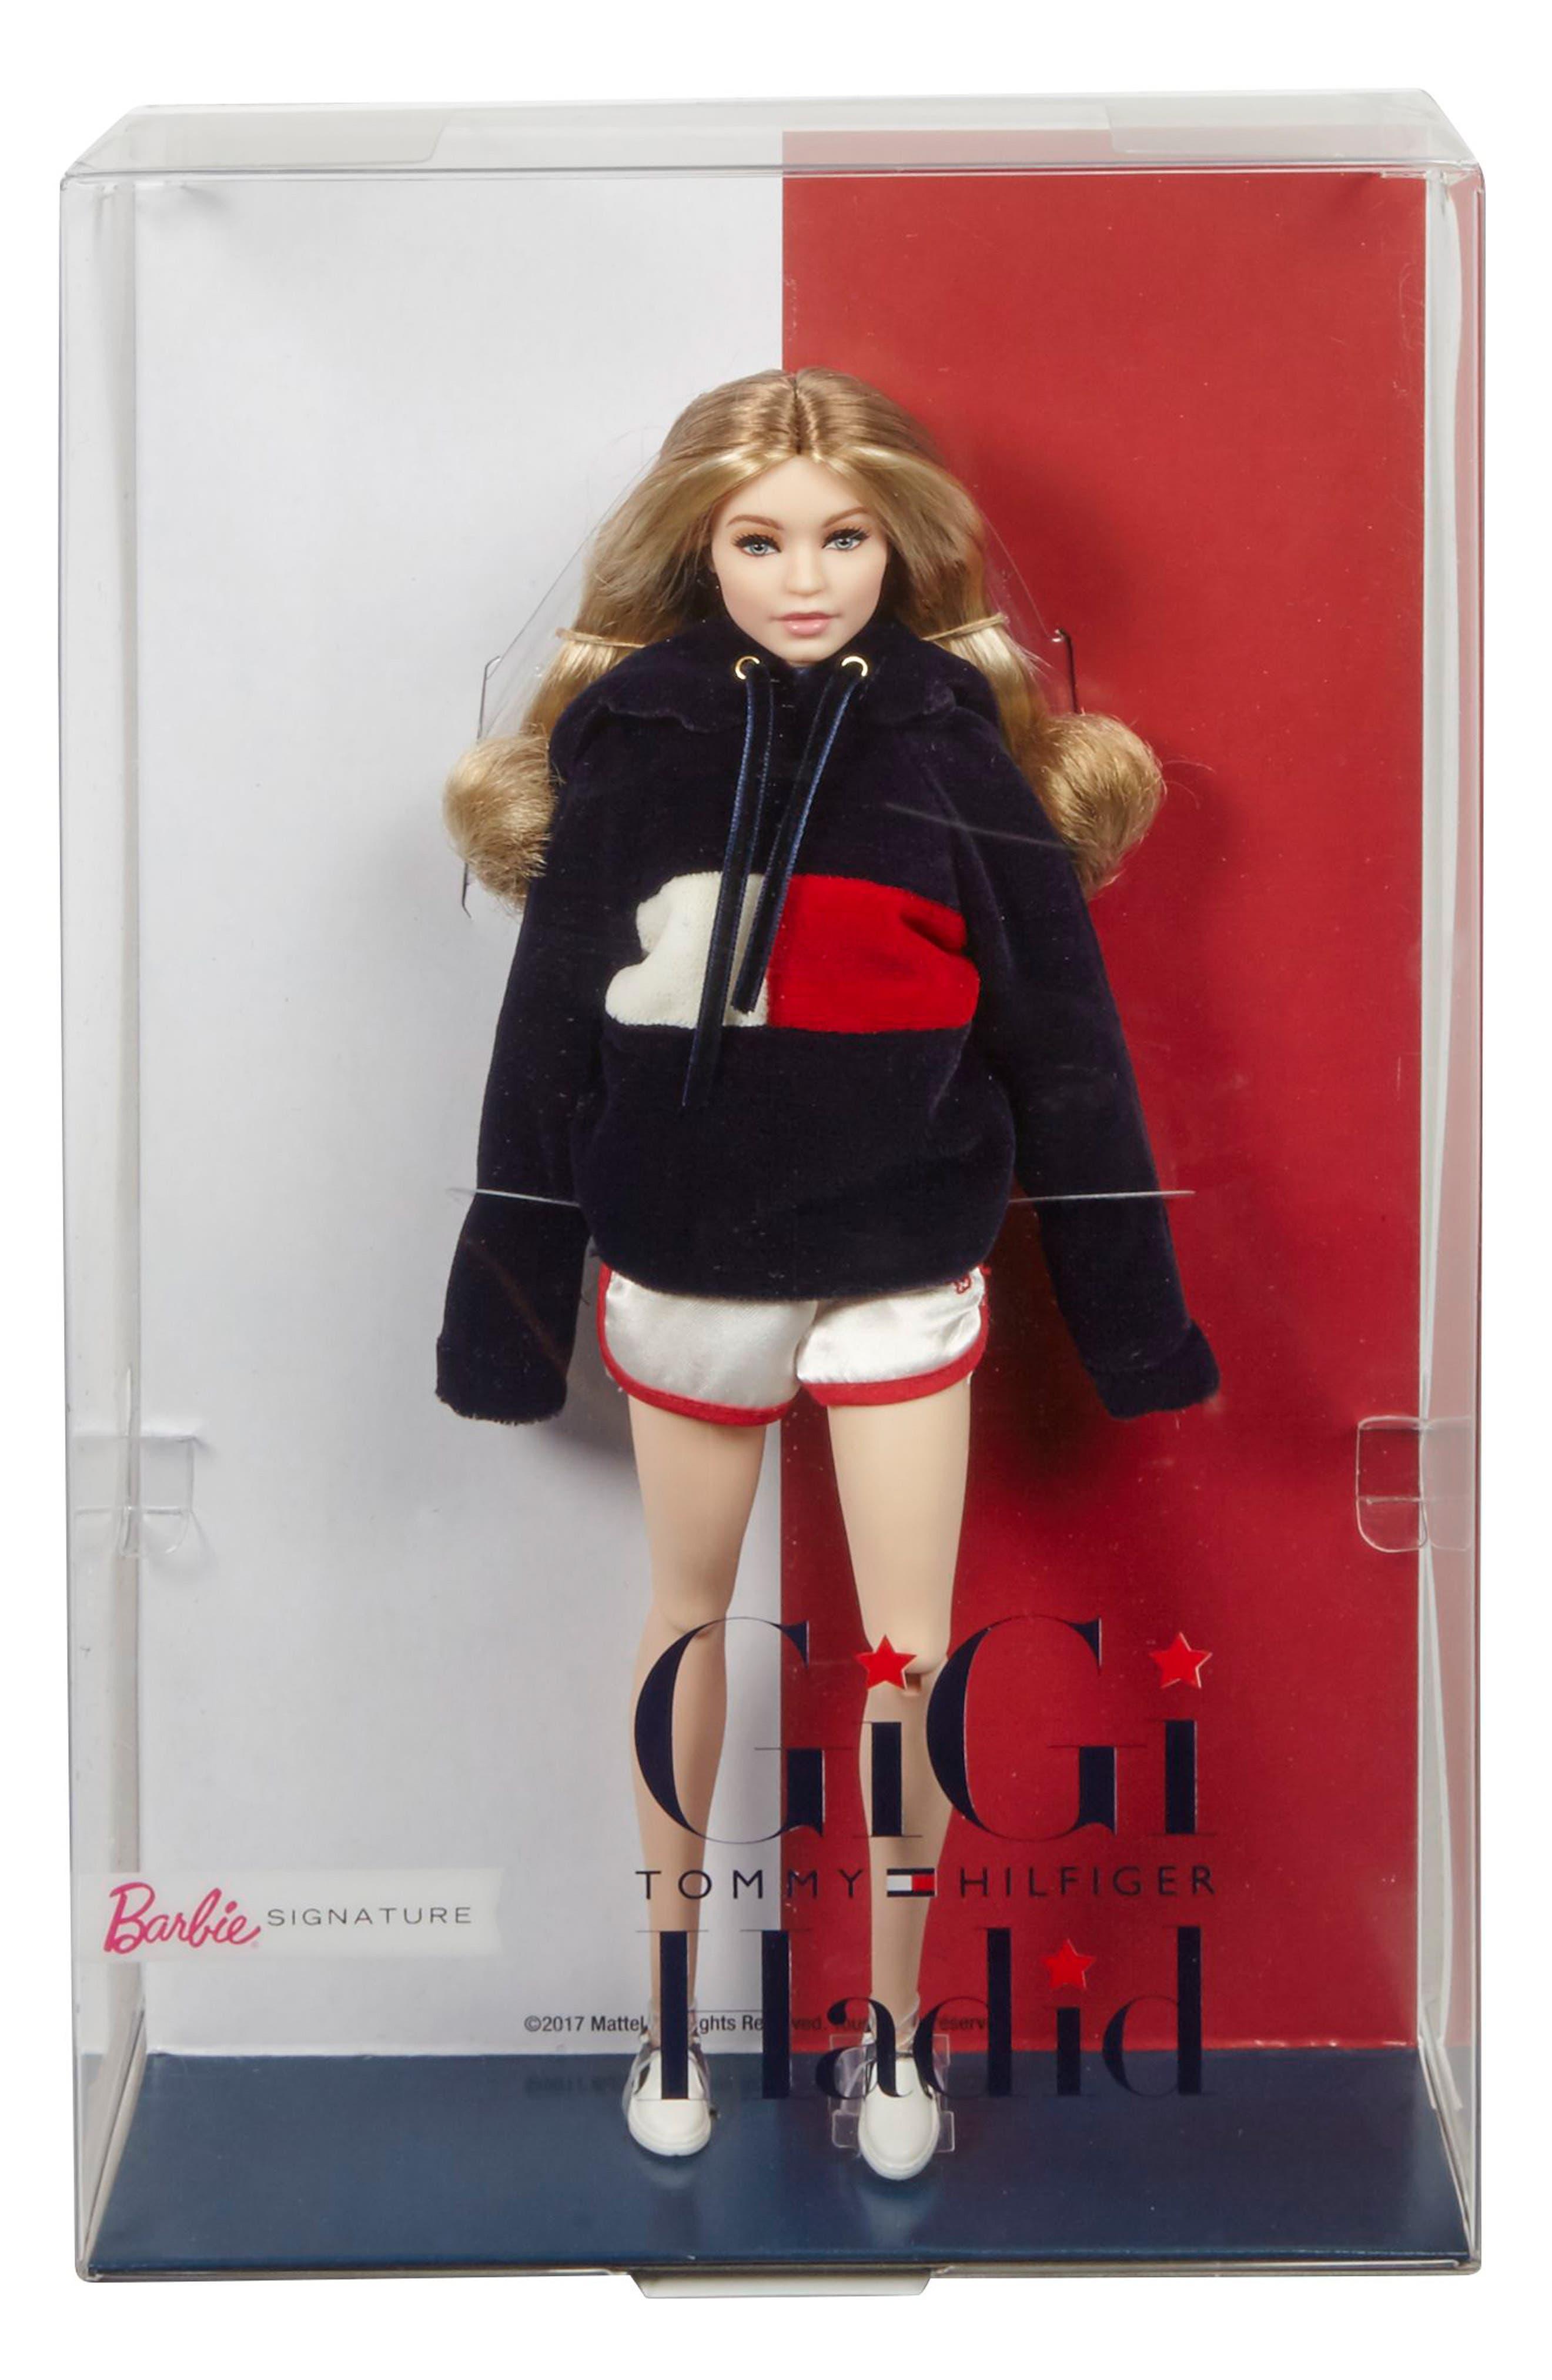 Main Image - Mattel Barbie® Signature Tommy Hilfiger x Gigi Hadid Doll